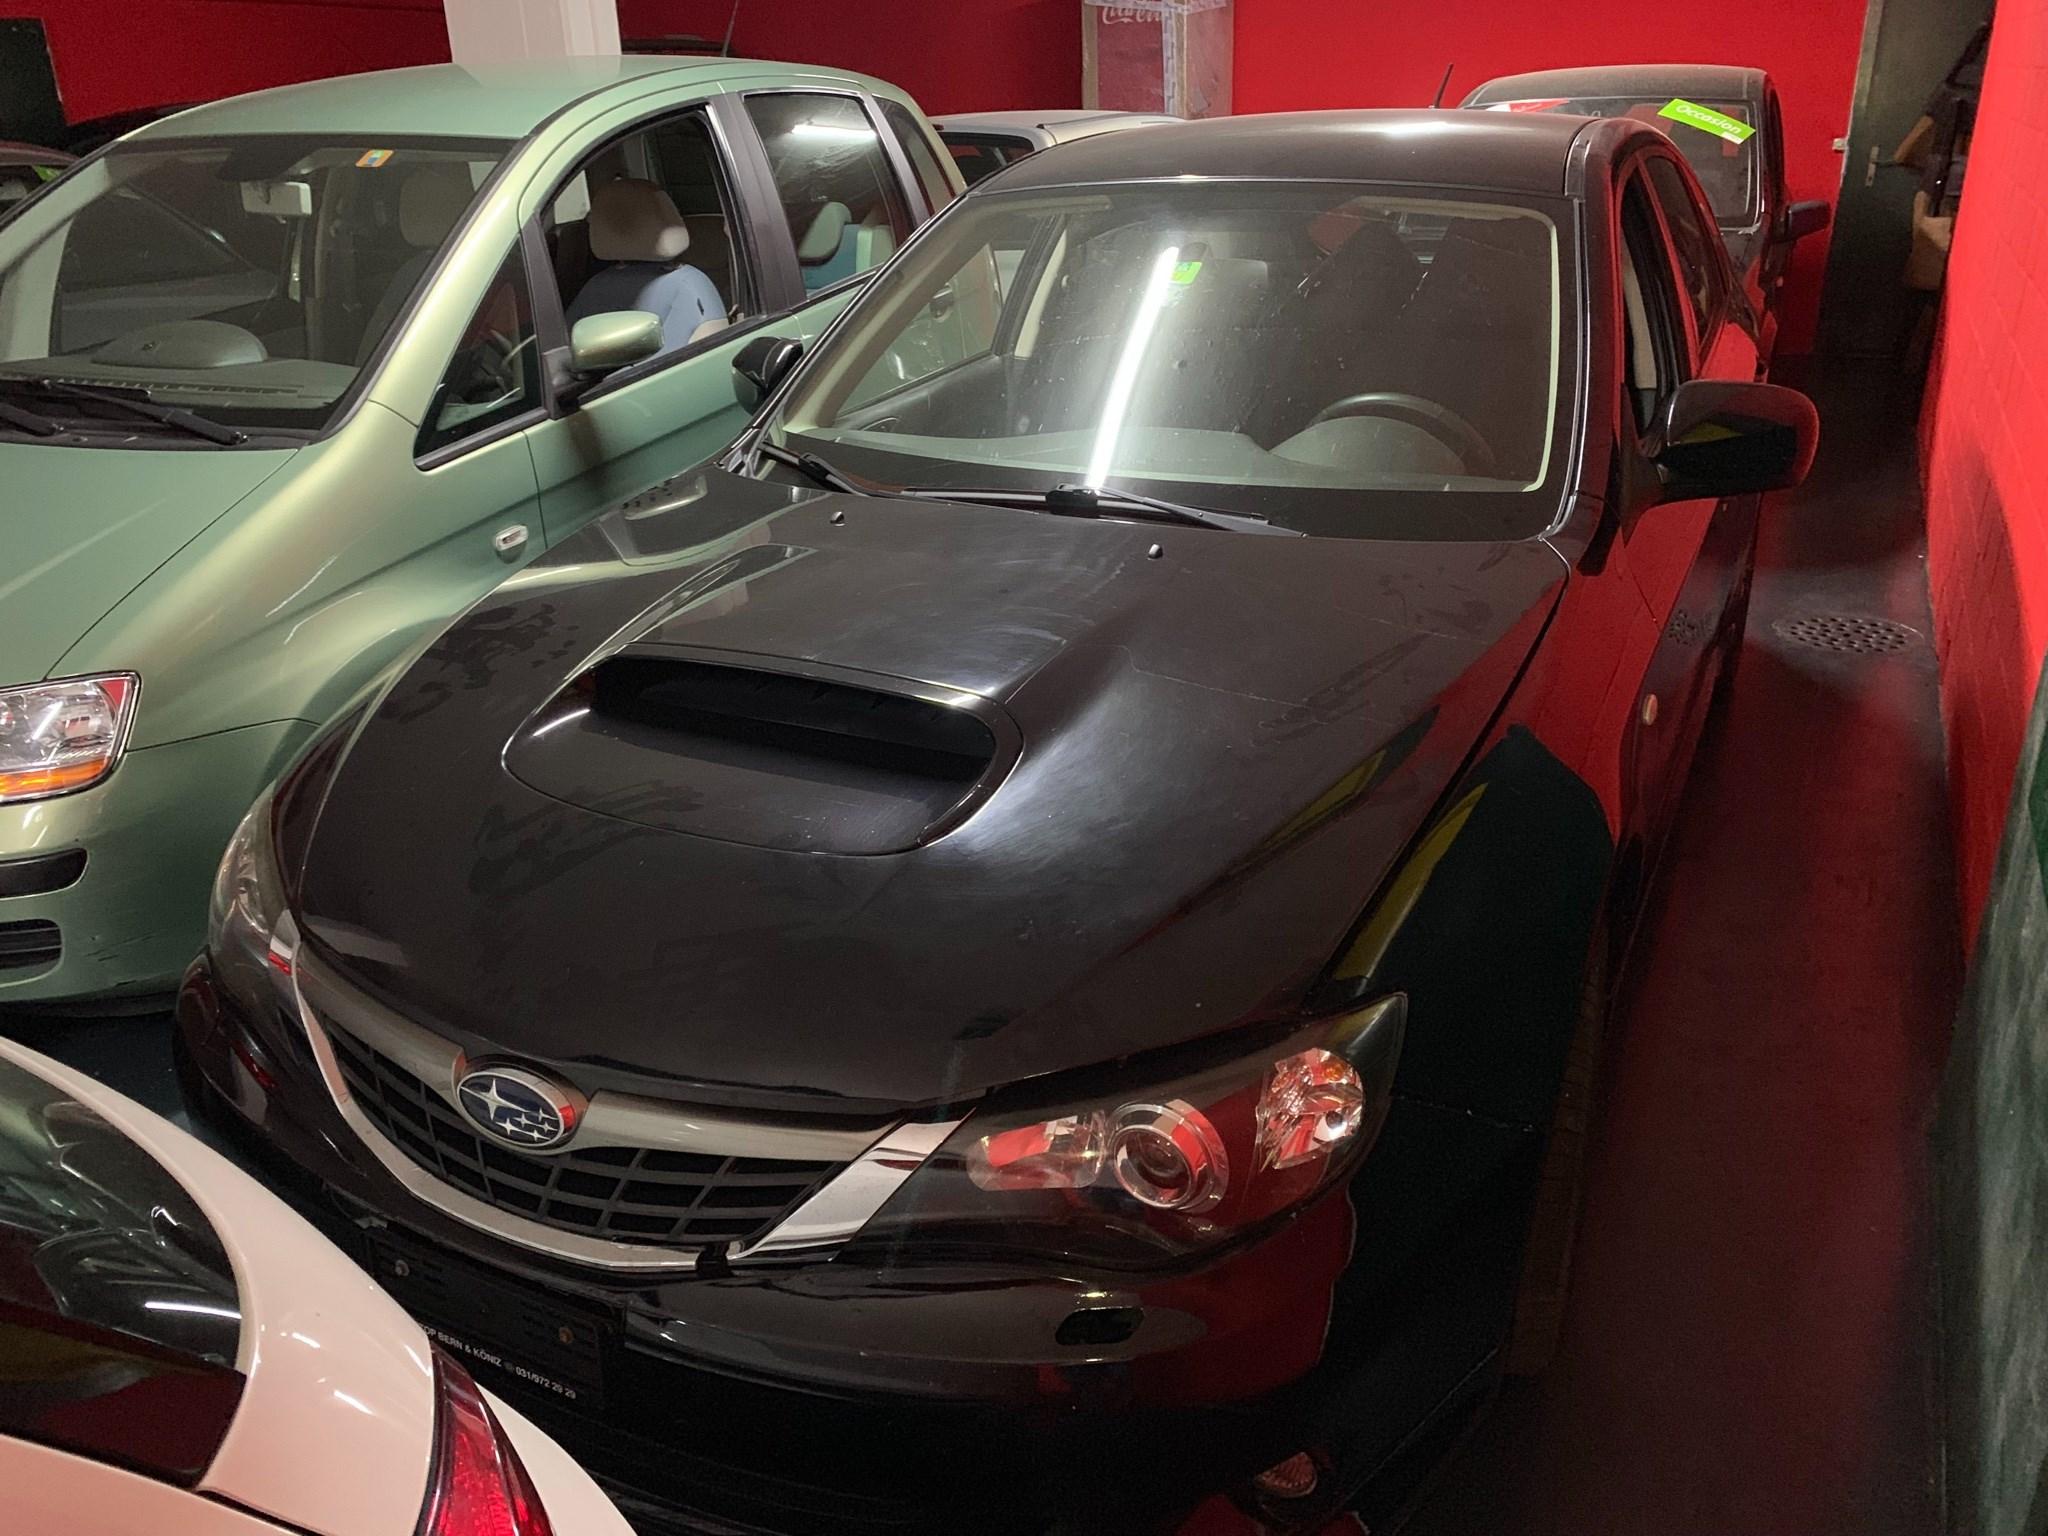 estate Subaru Impreza 2.0D Comfort S